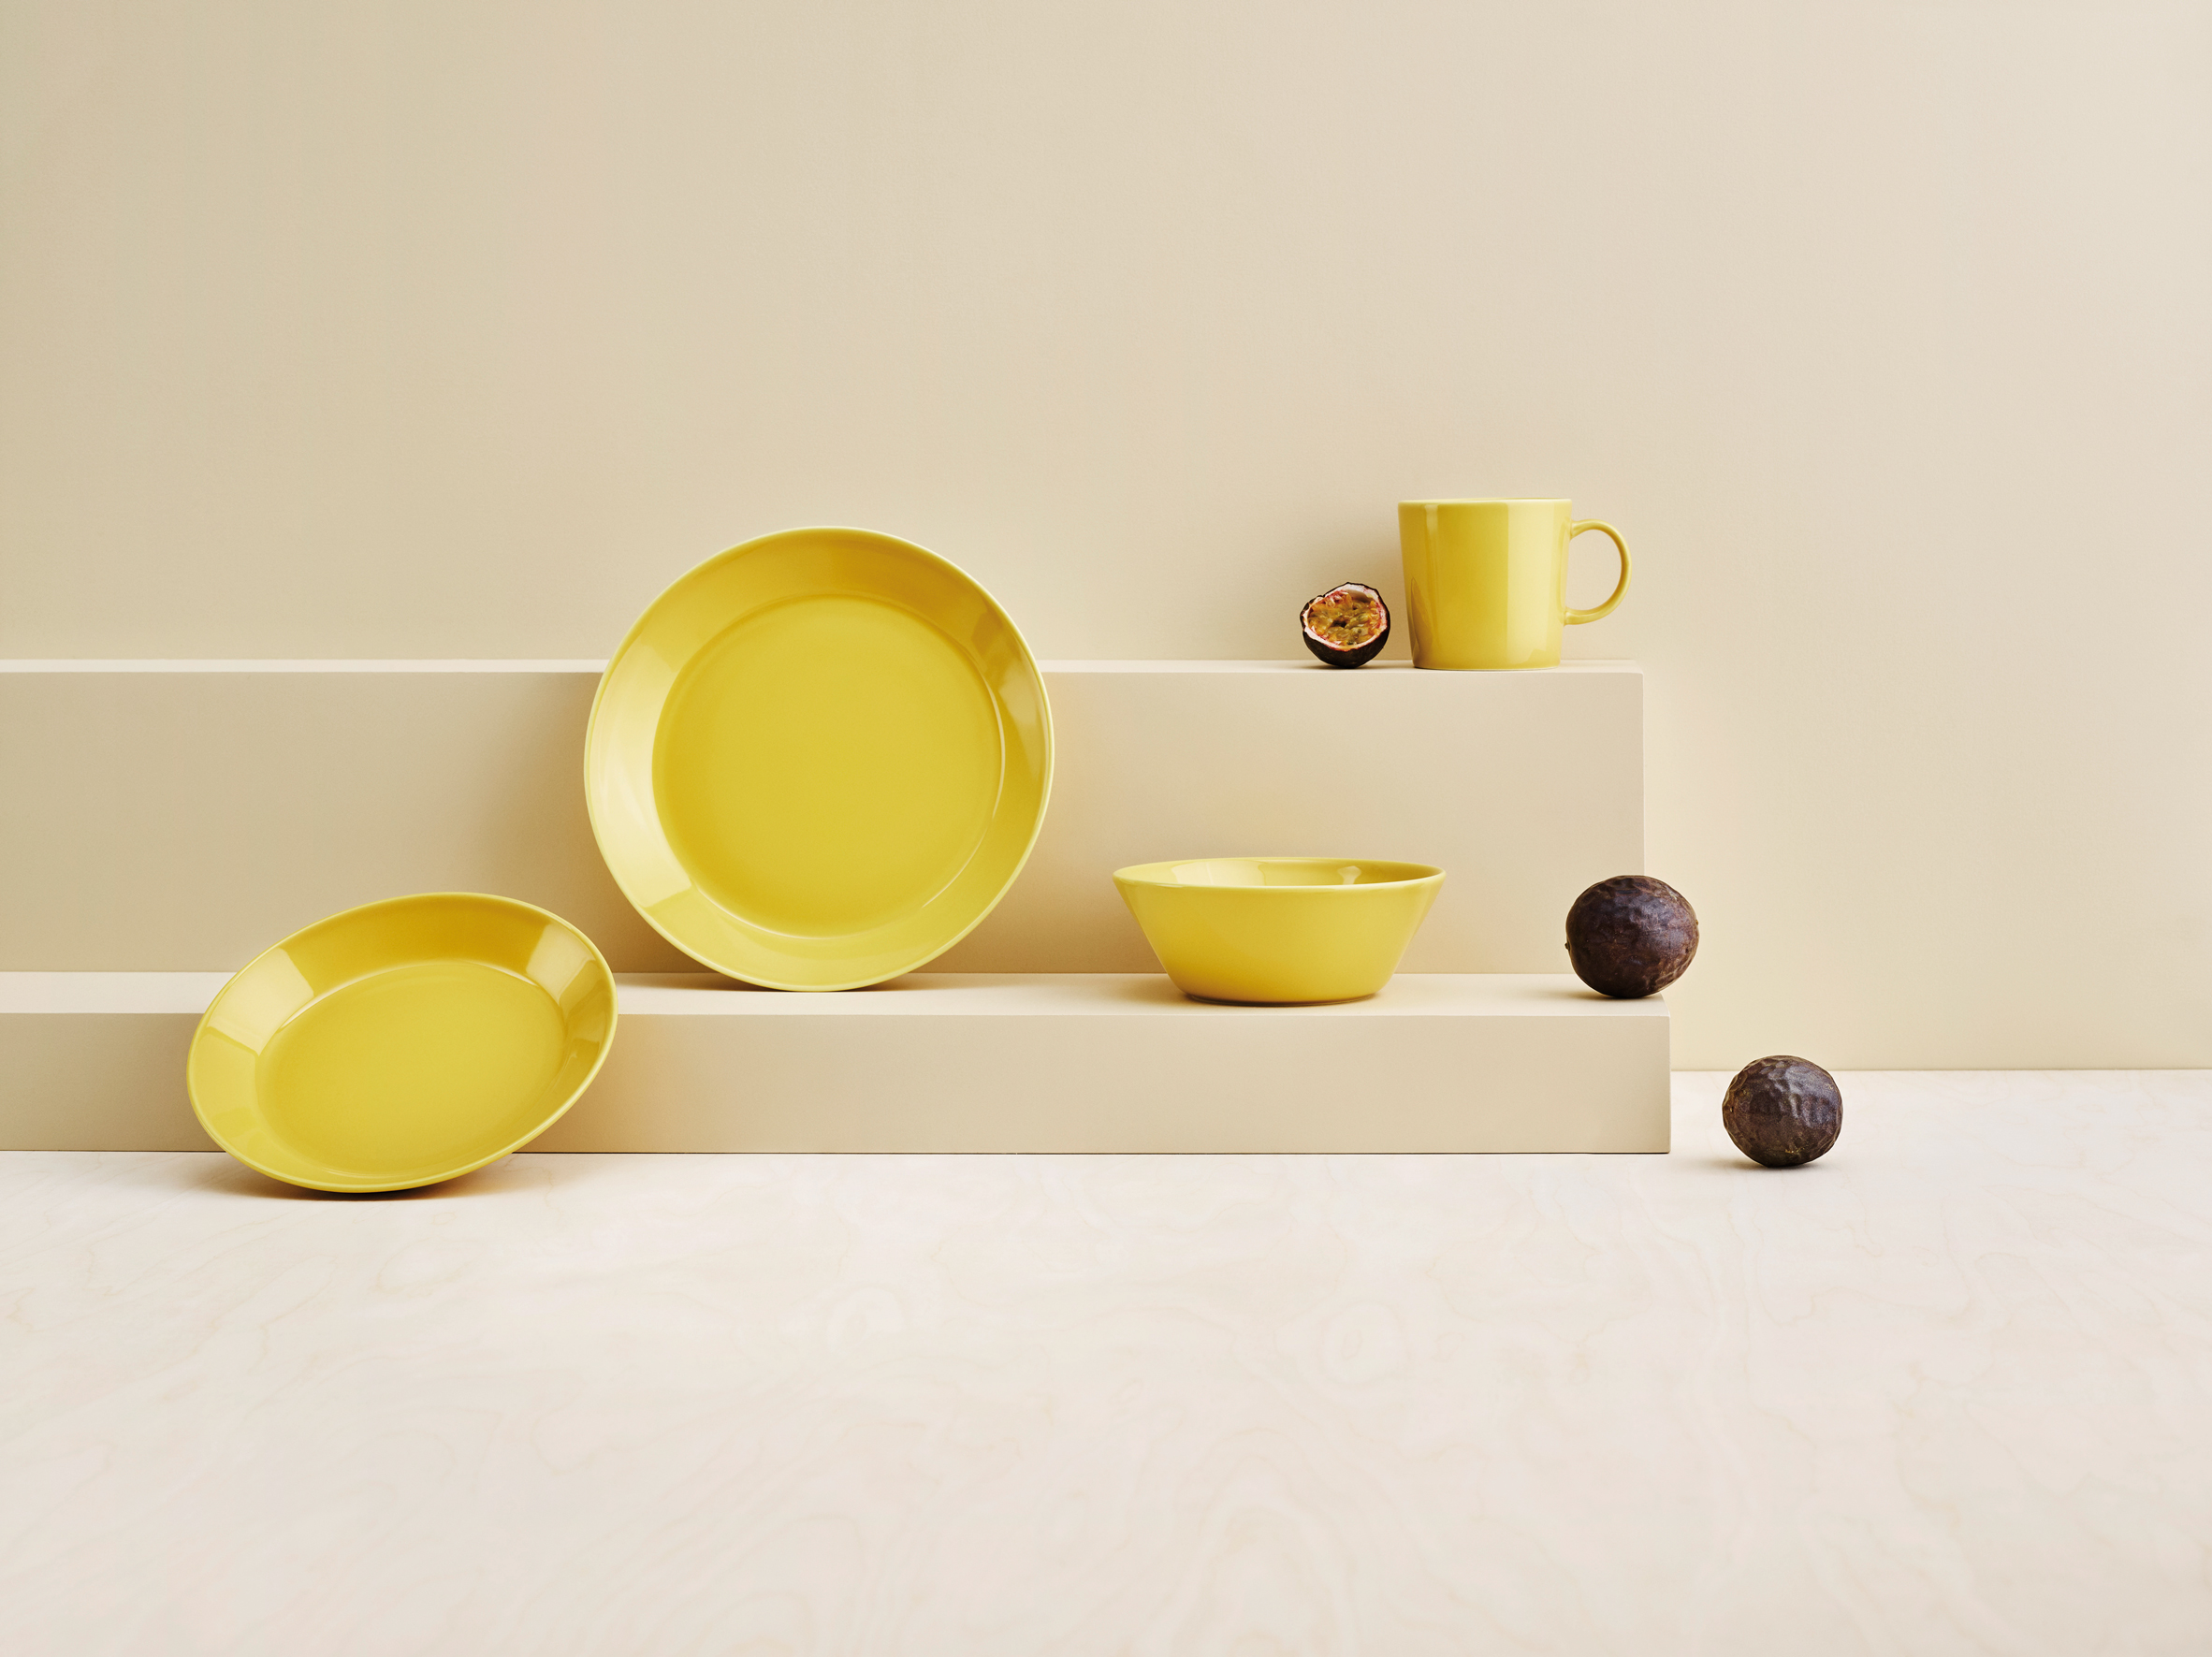 Teema Honey from Iittala for Dezeen x Planted